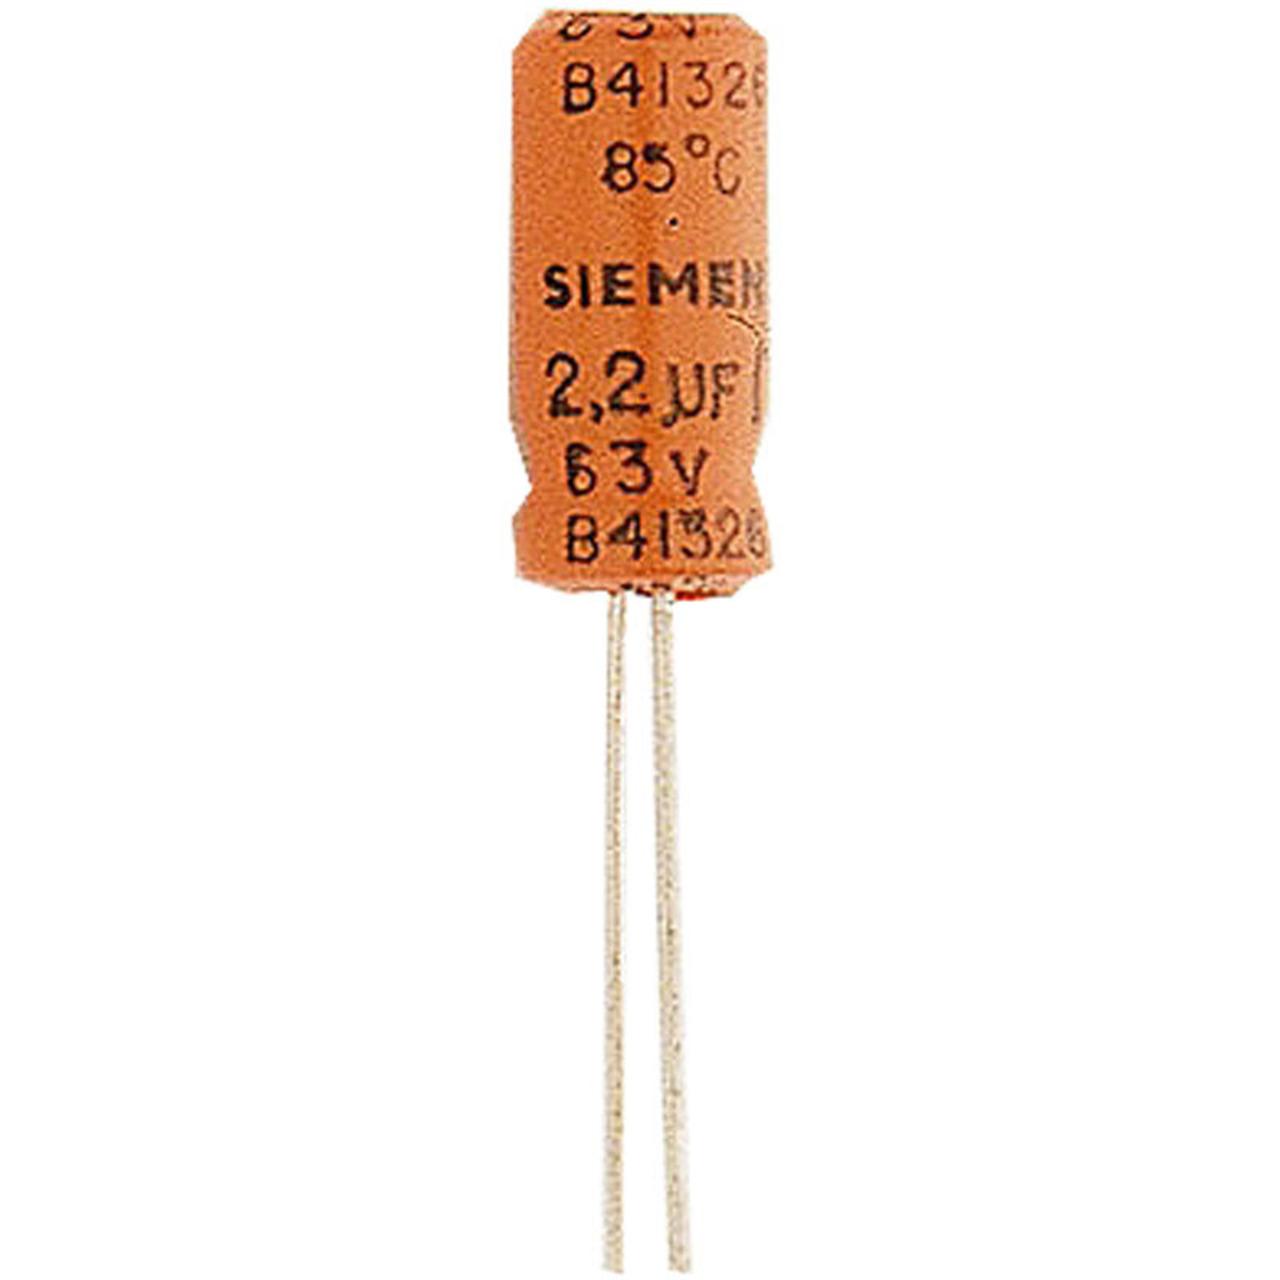 Elektrolytkondensator 4700 -F- 63 V- RM 10 mm- radial